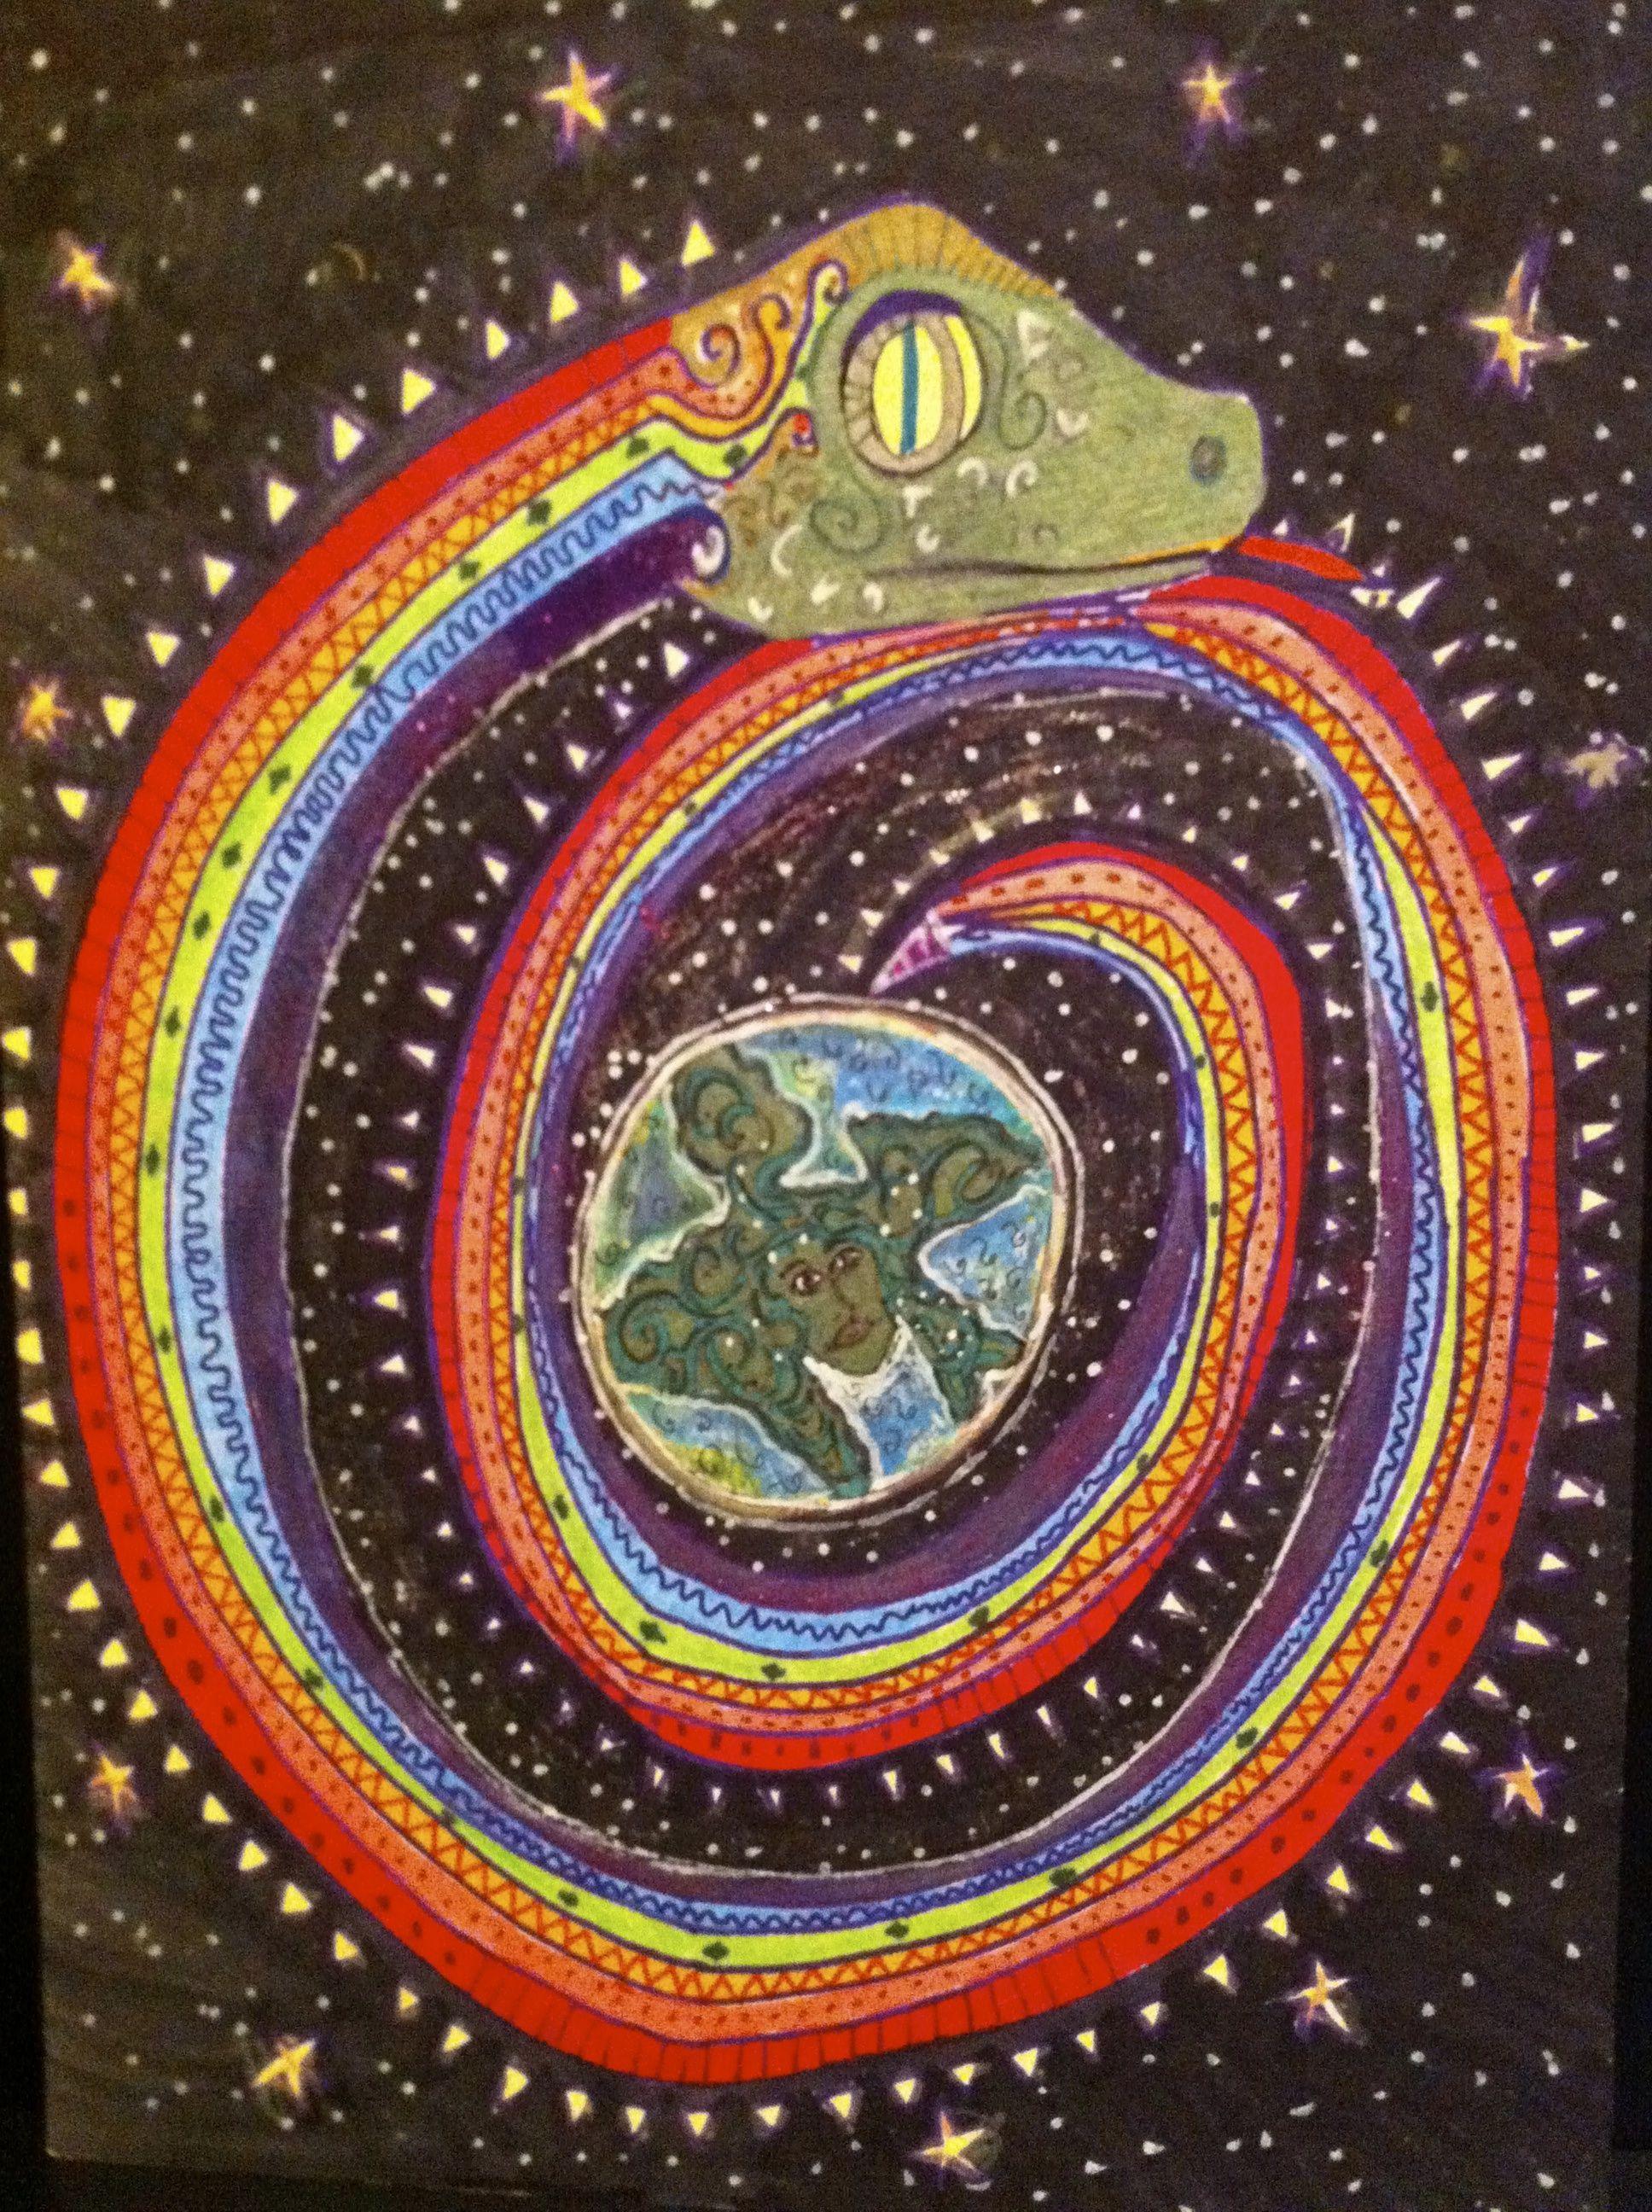 Sharpie Art Rainbow Serpent With Images Rainbow Serpent